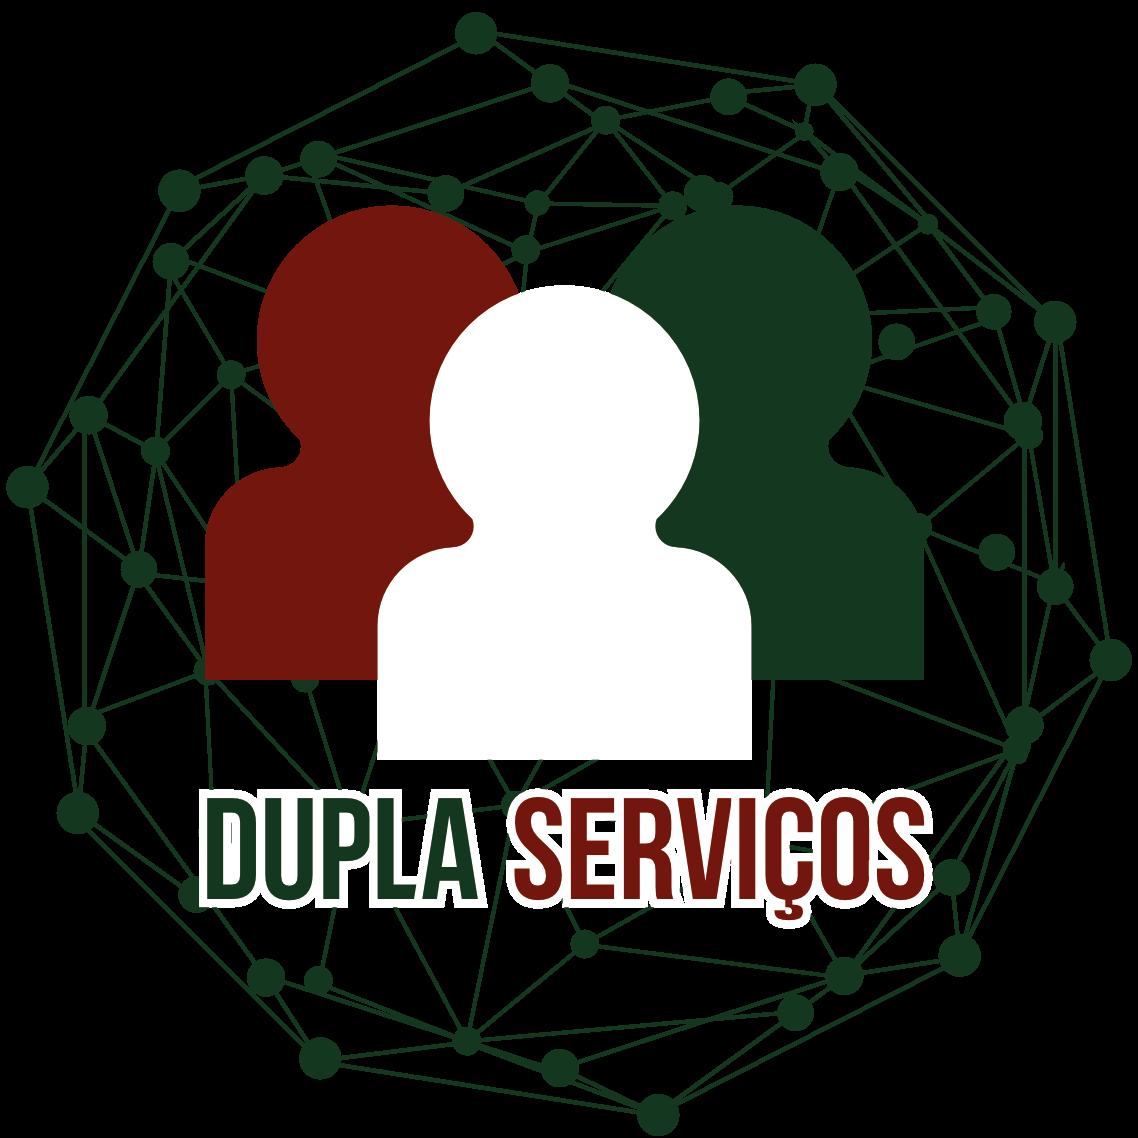 Dupla Serviços